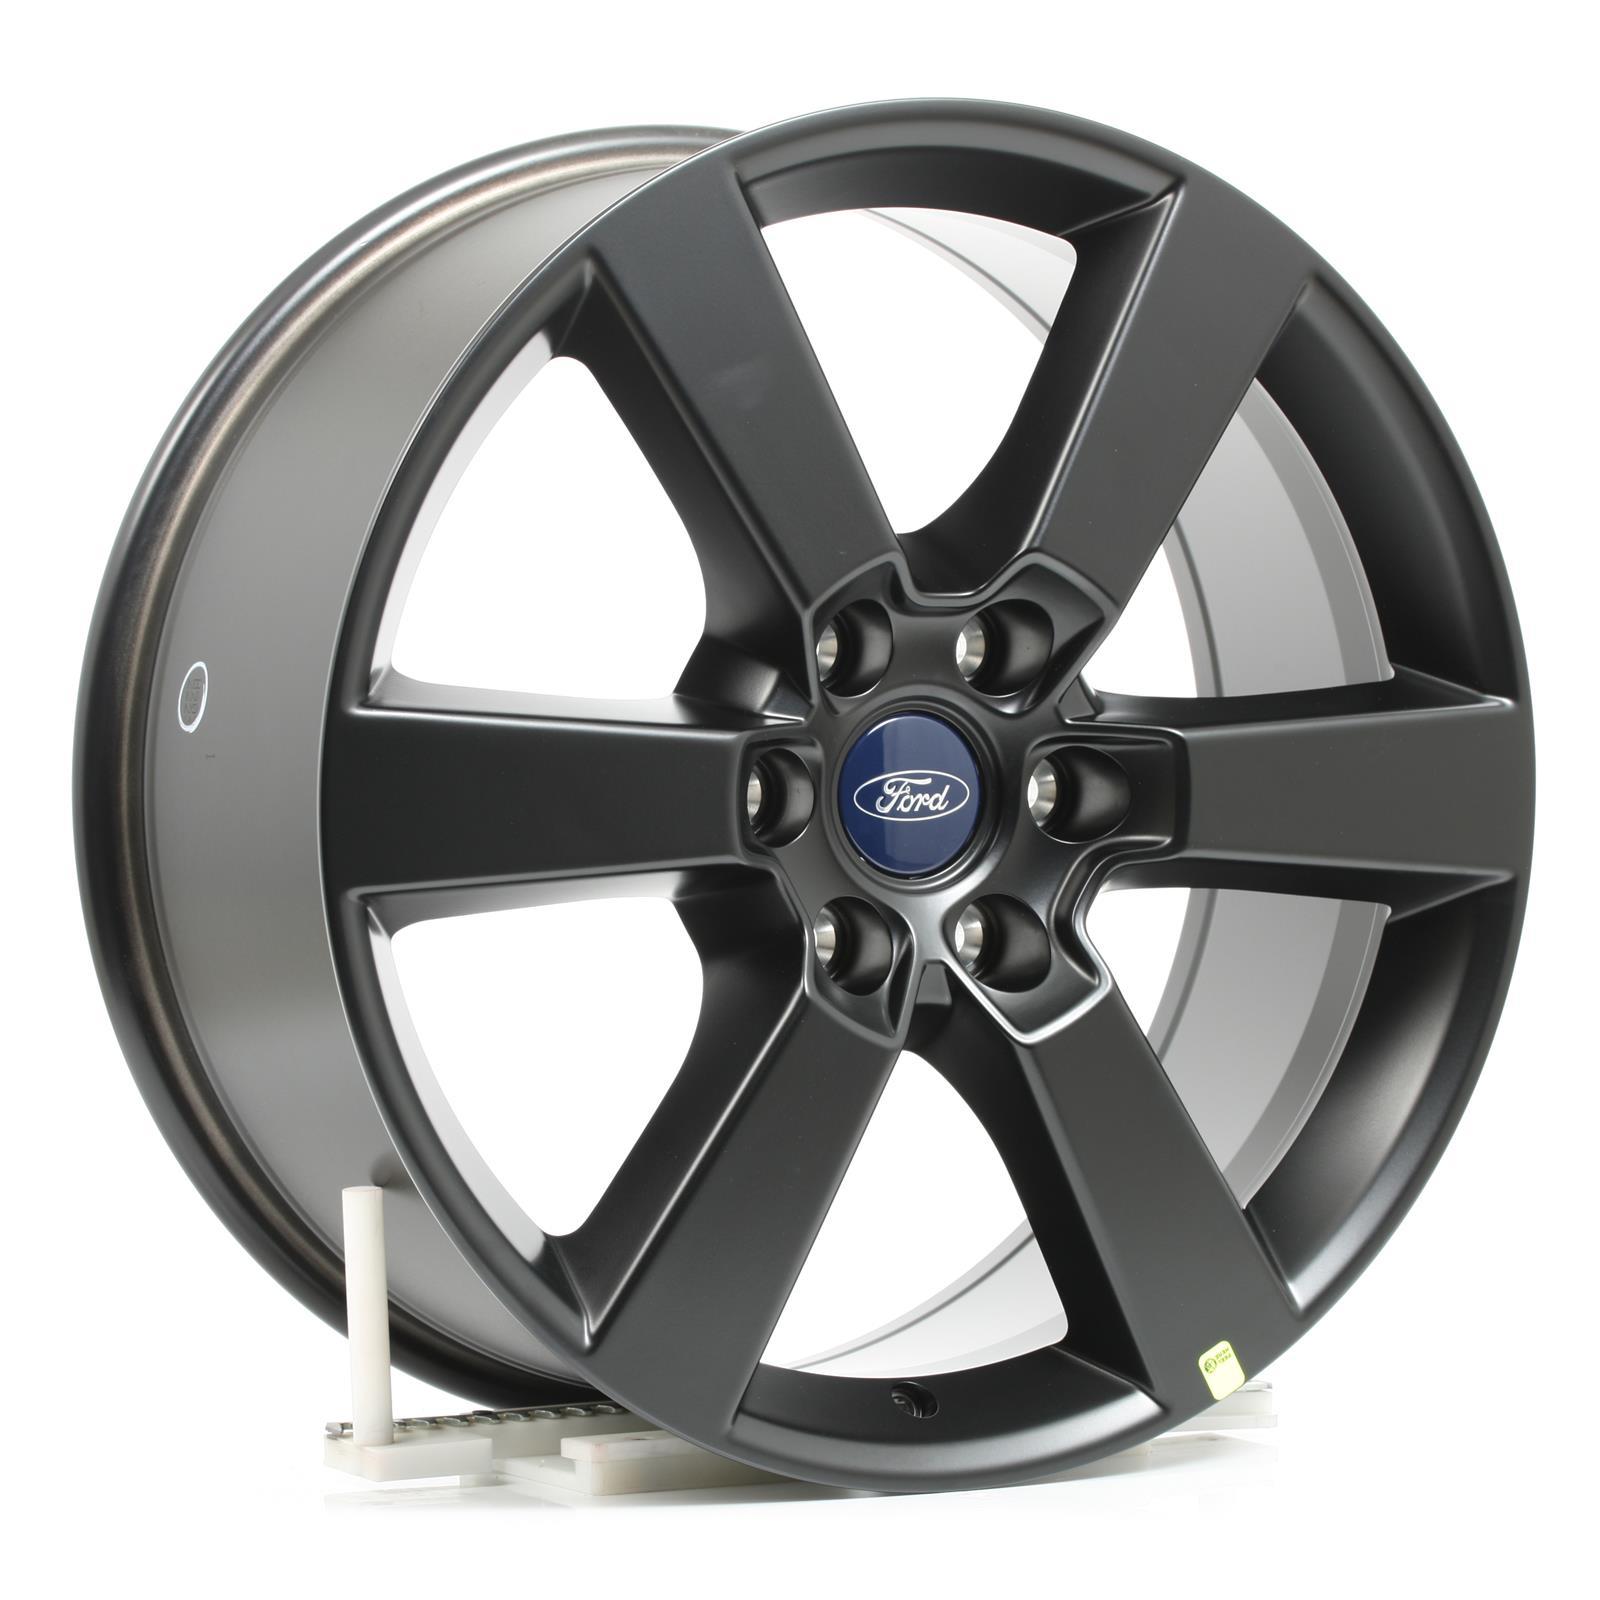 Ford F-150 in Black on Silver Chrome Aluminum Tire Valve Stem Caps